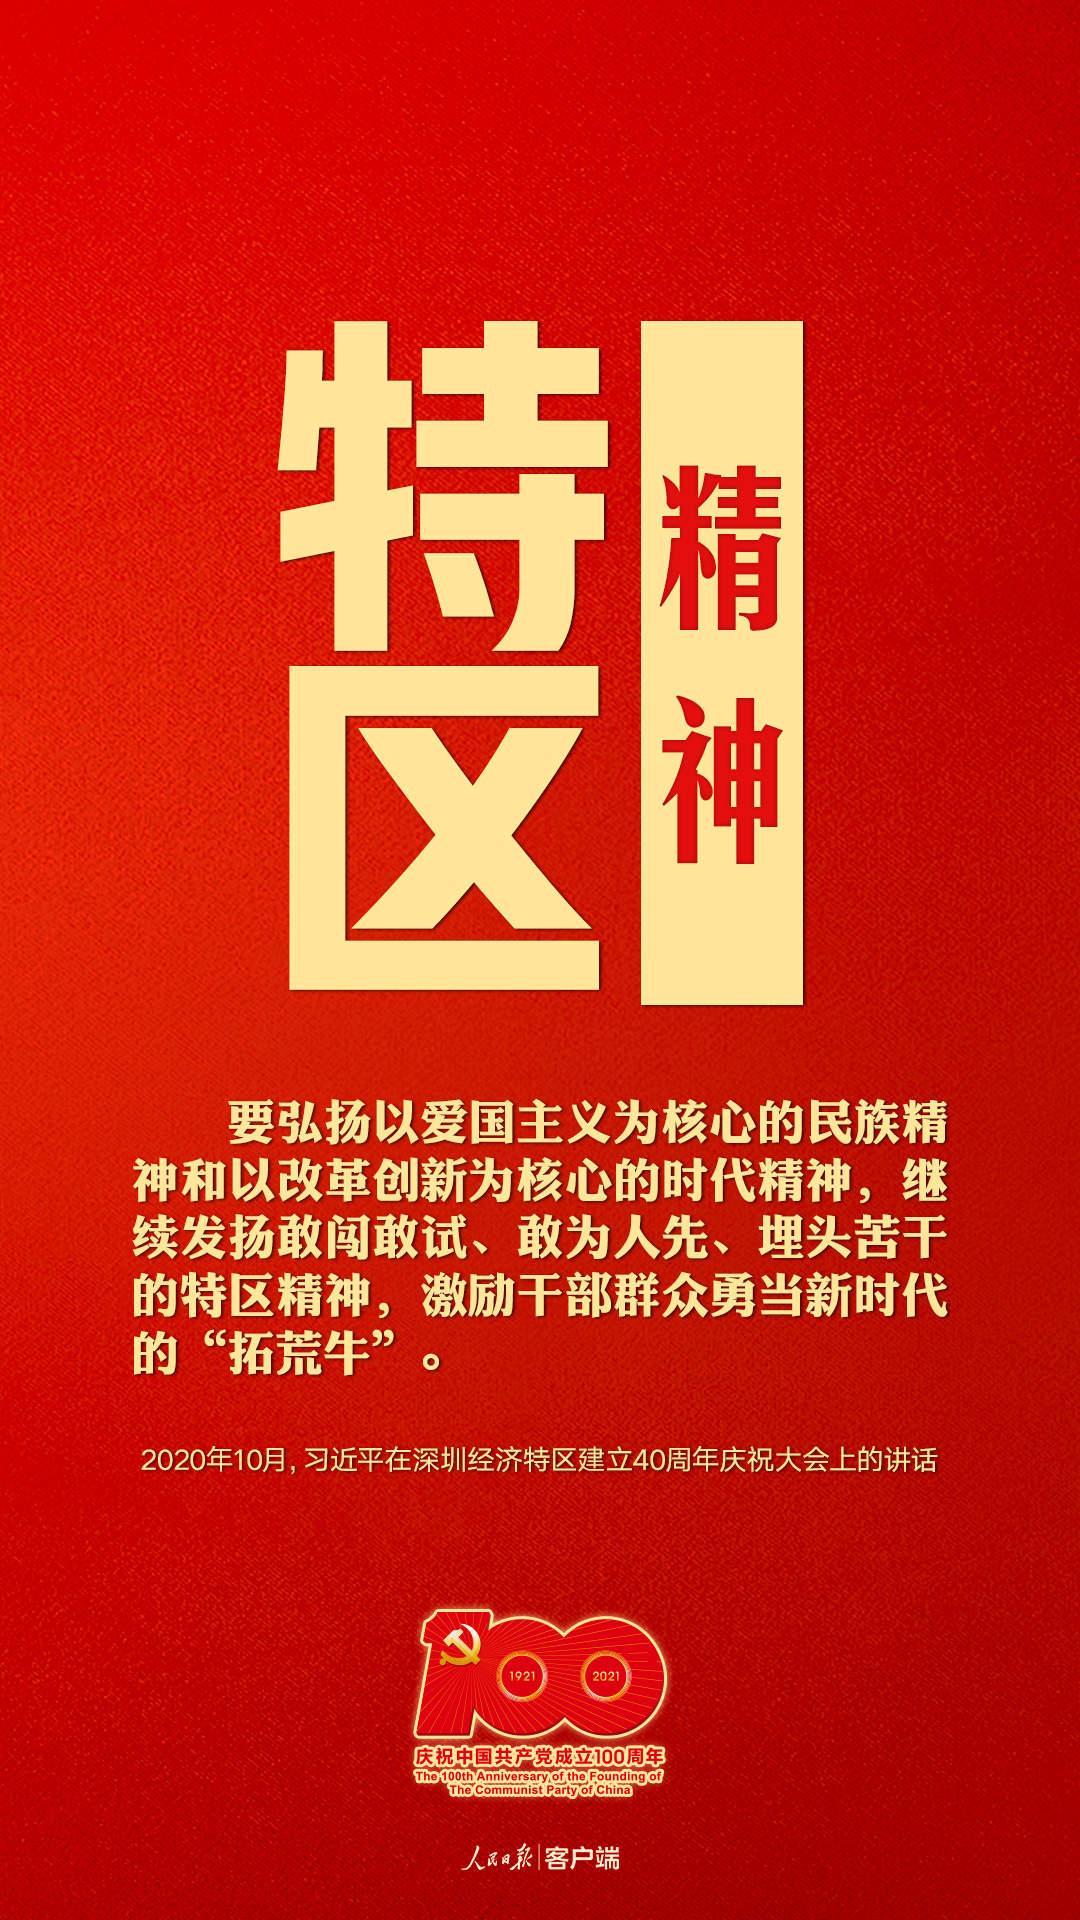 10.jpg?x-oss-process=style/w10